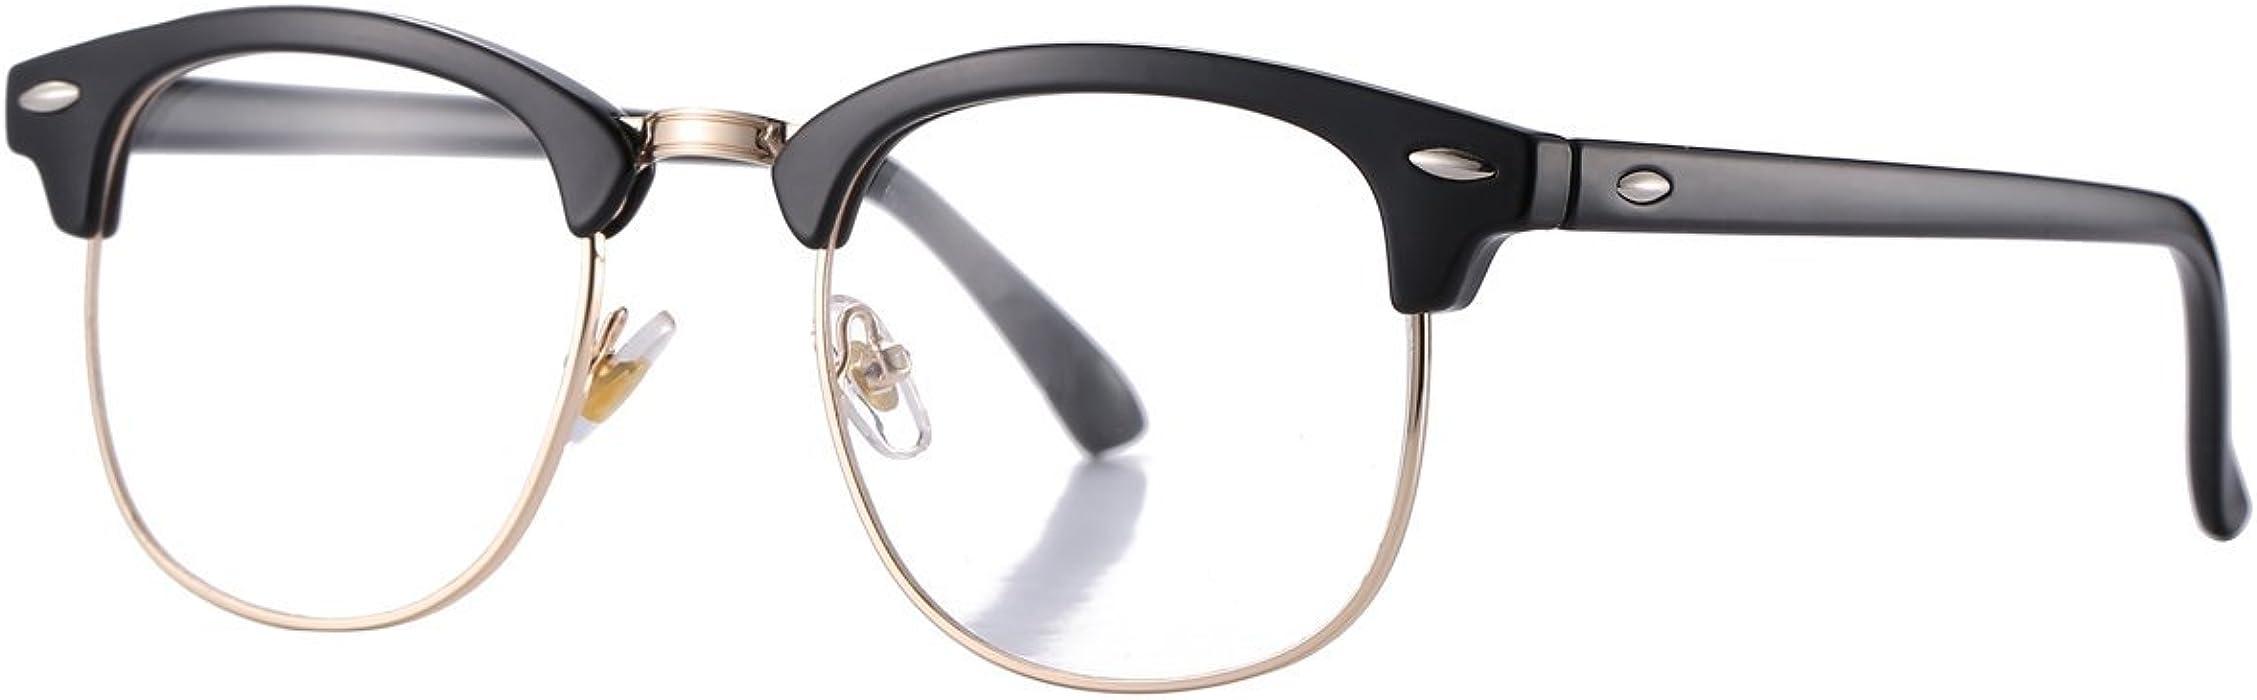 83503f68dc0 Pro Acme (Pack of 2) Semi Rimless Polarized Clubmaster Sunglasses for Men  Women (